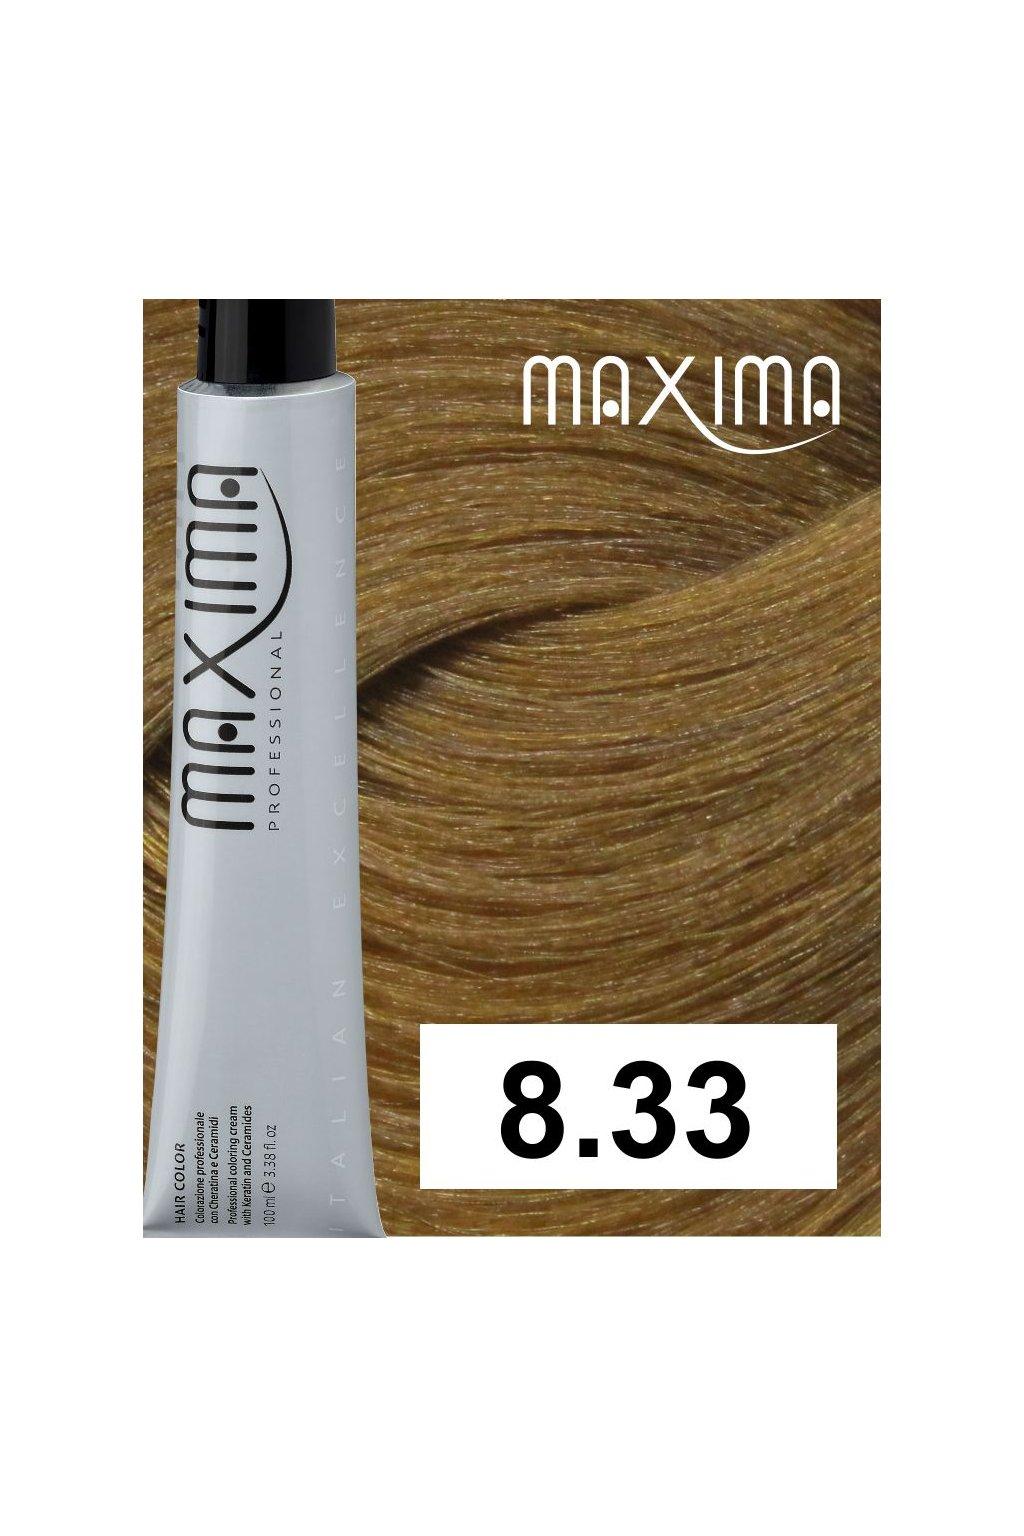 8 33 max